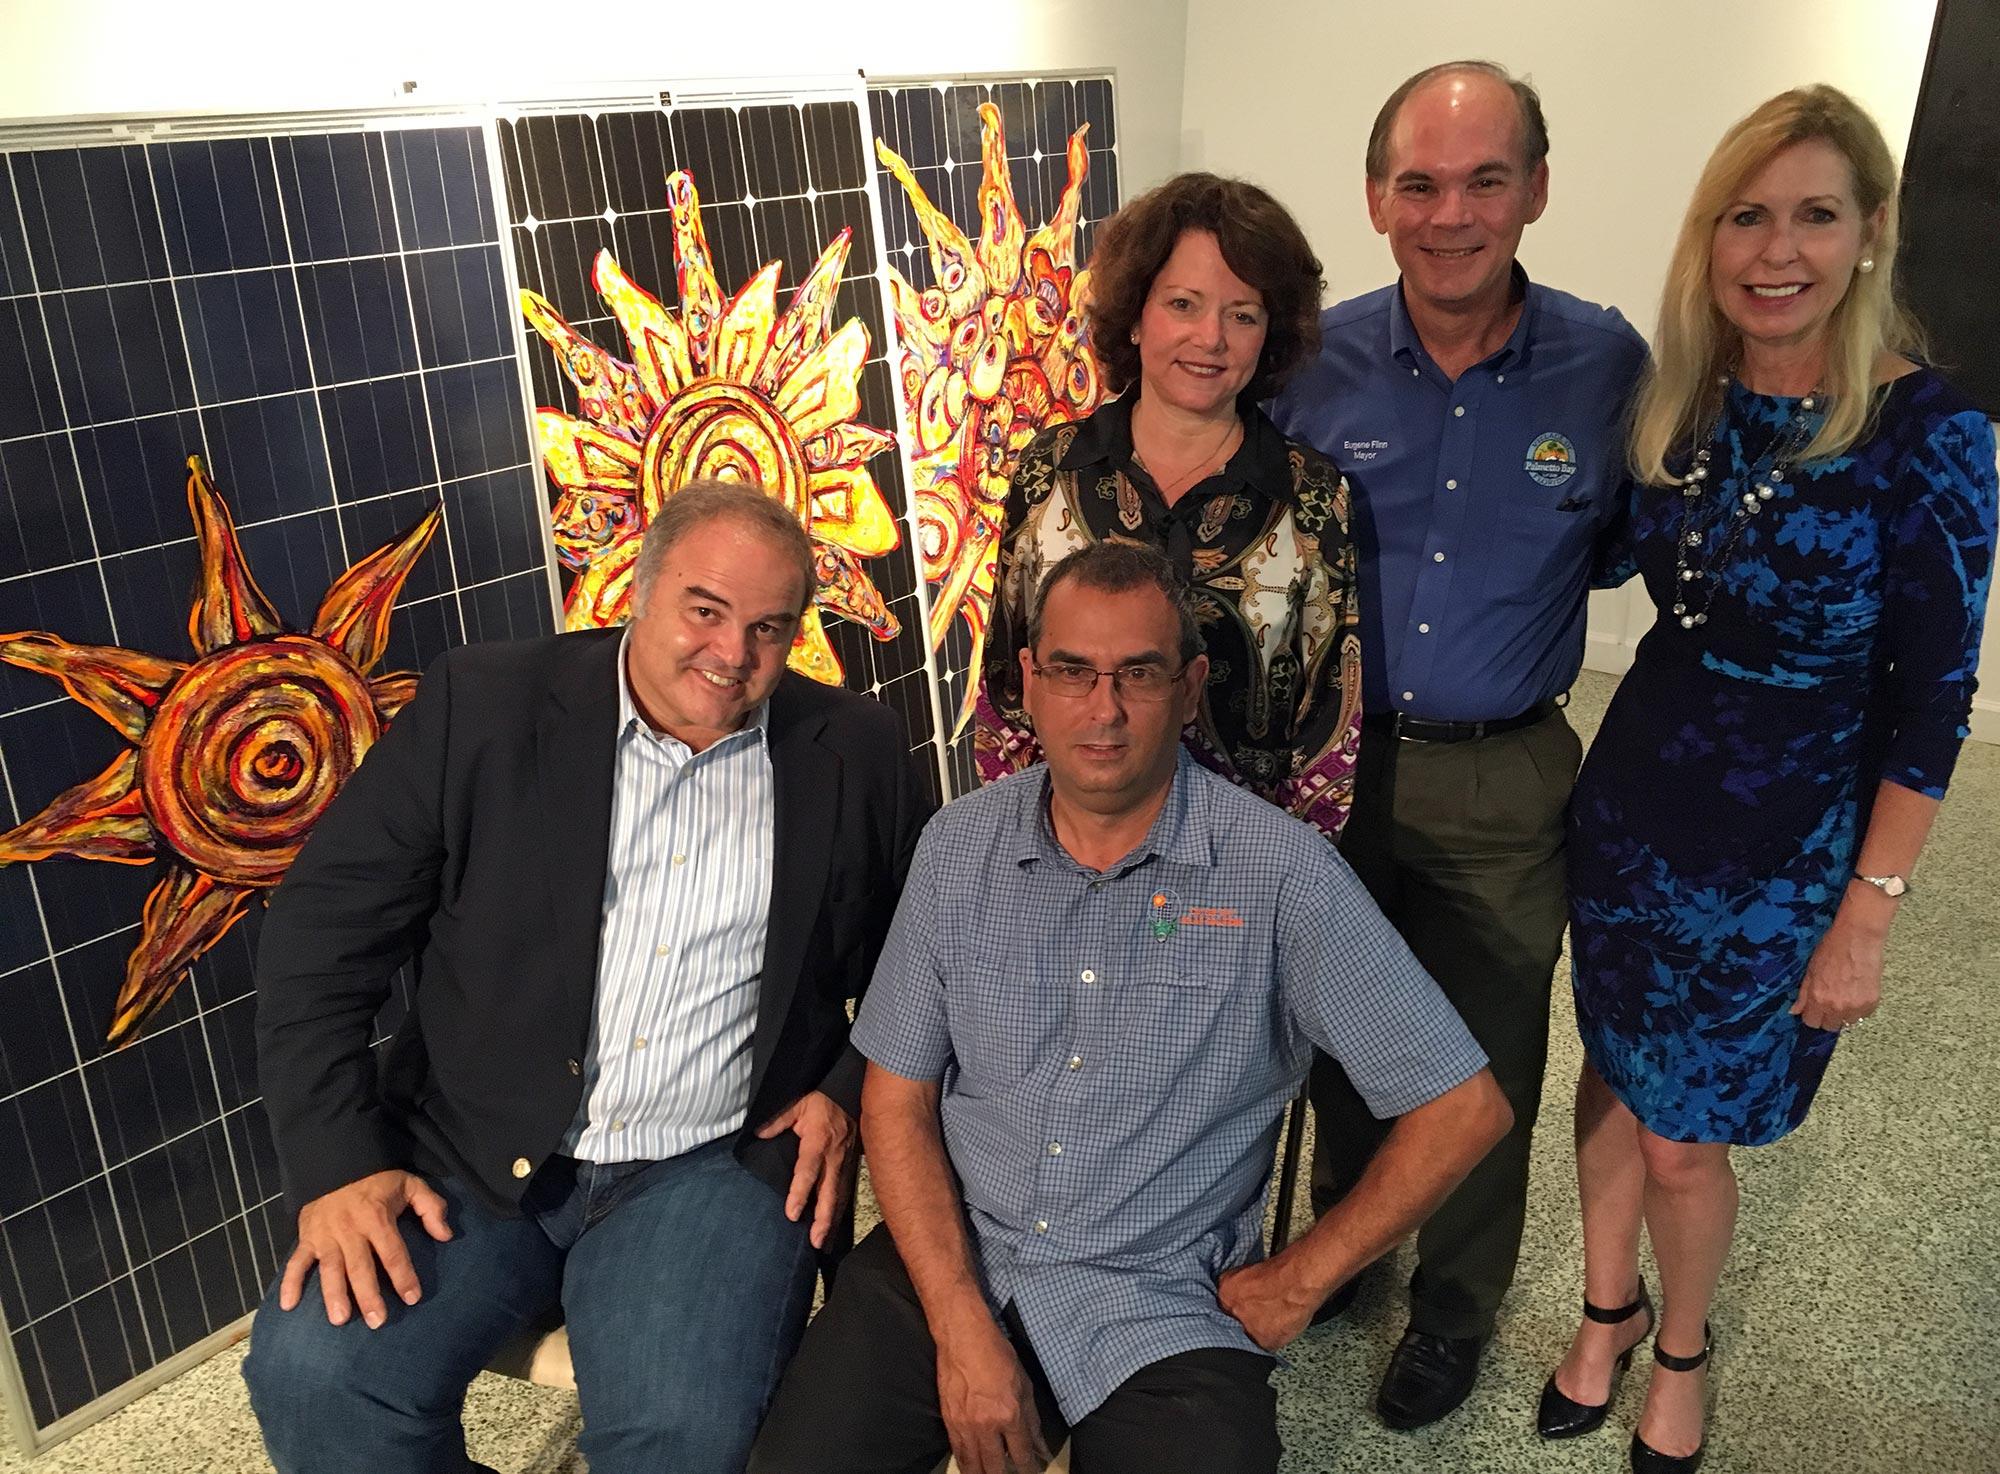 [L to R] Artist Xavier Cortada, Raul Vergara (owner, Cutler Bay Solar Solutions), Pinecrest Mayor Cindy Lerner, Palmetto Bay Mayor Eugene Flinn and Cutler Bay Mayor Peggy Bell.